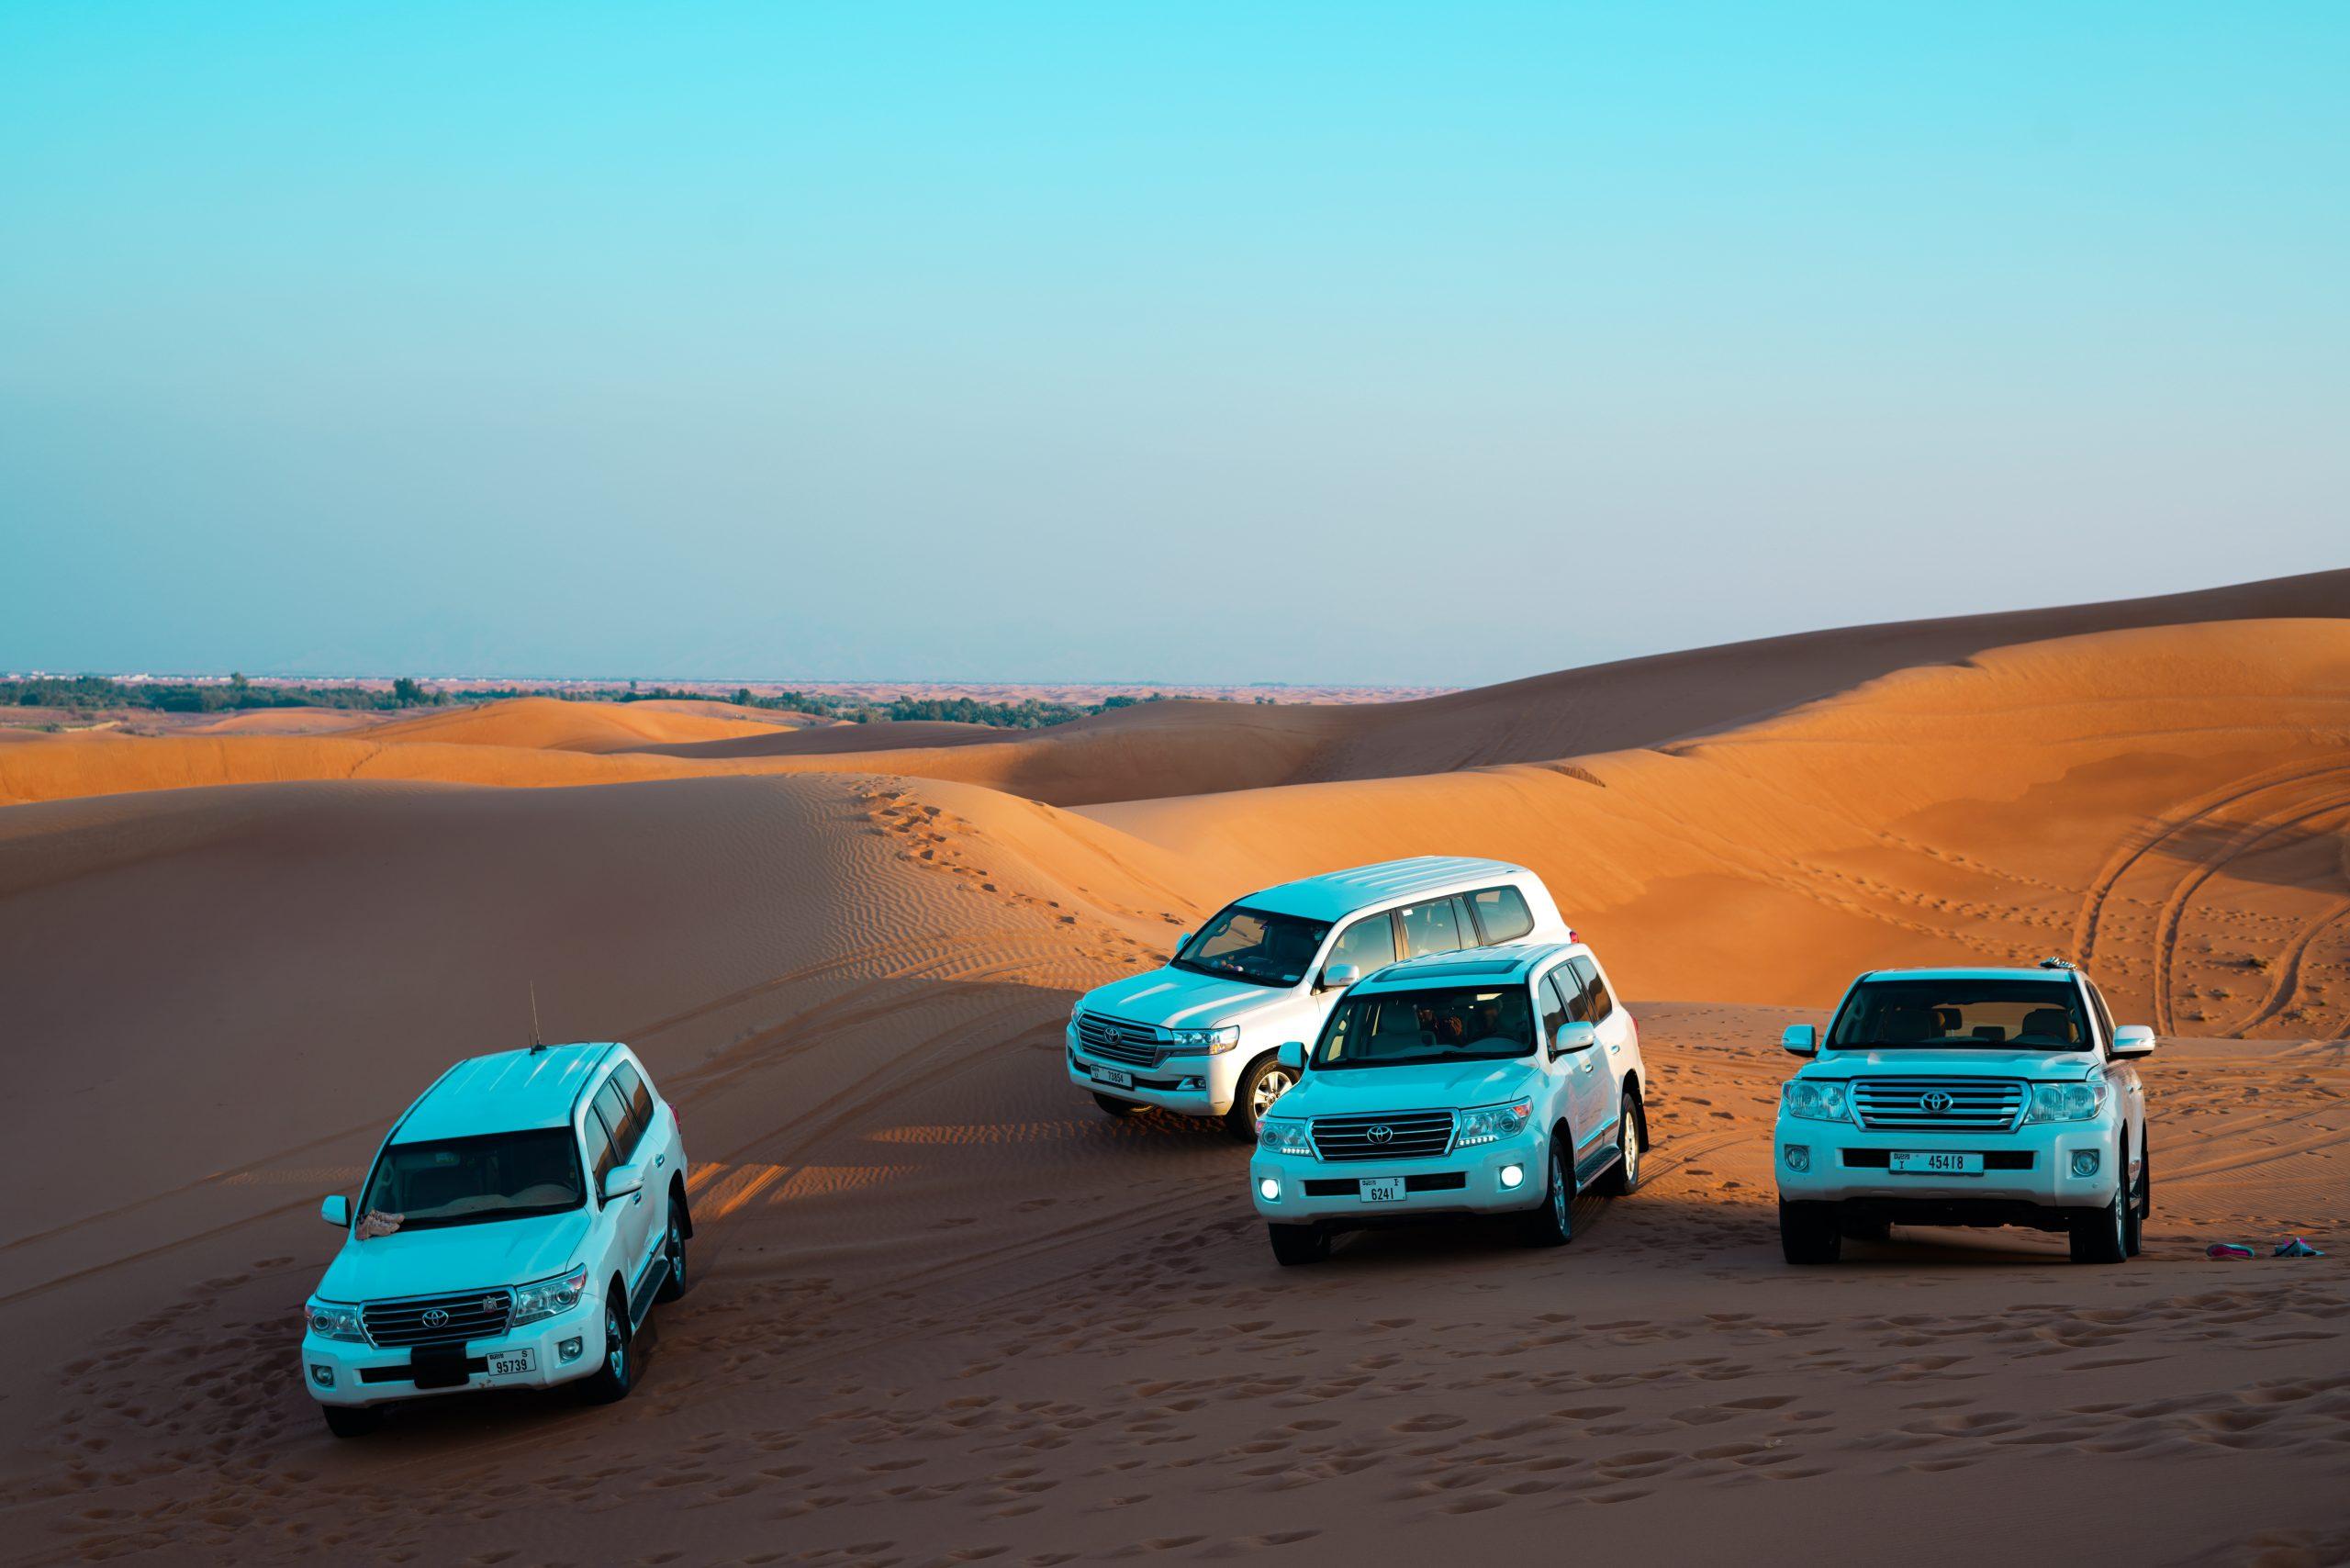 Desert Safari vehicles